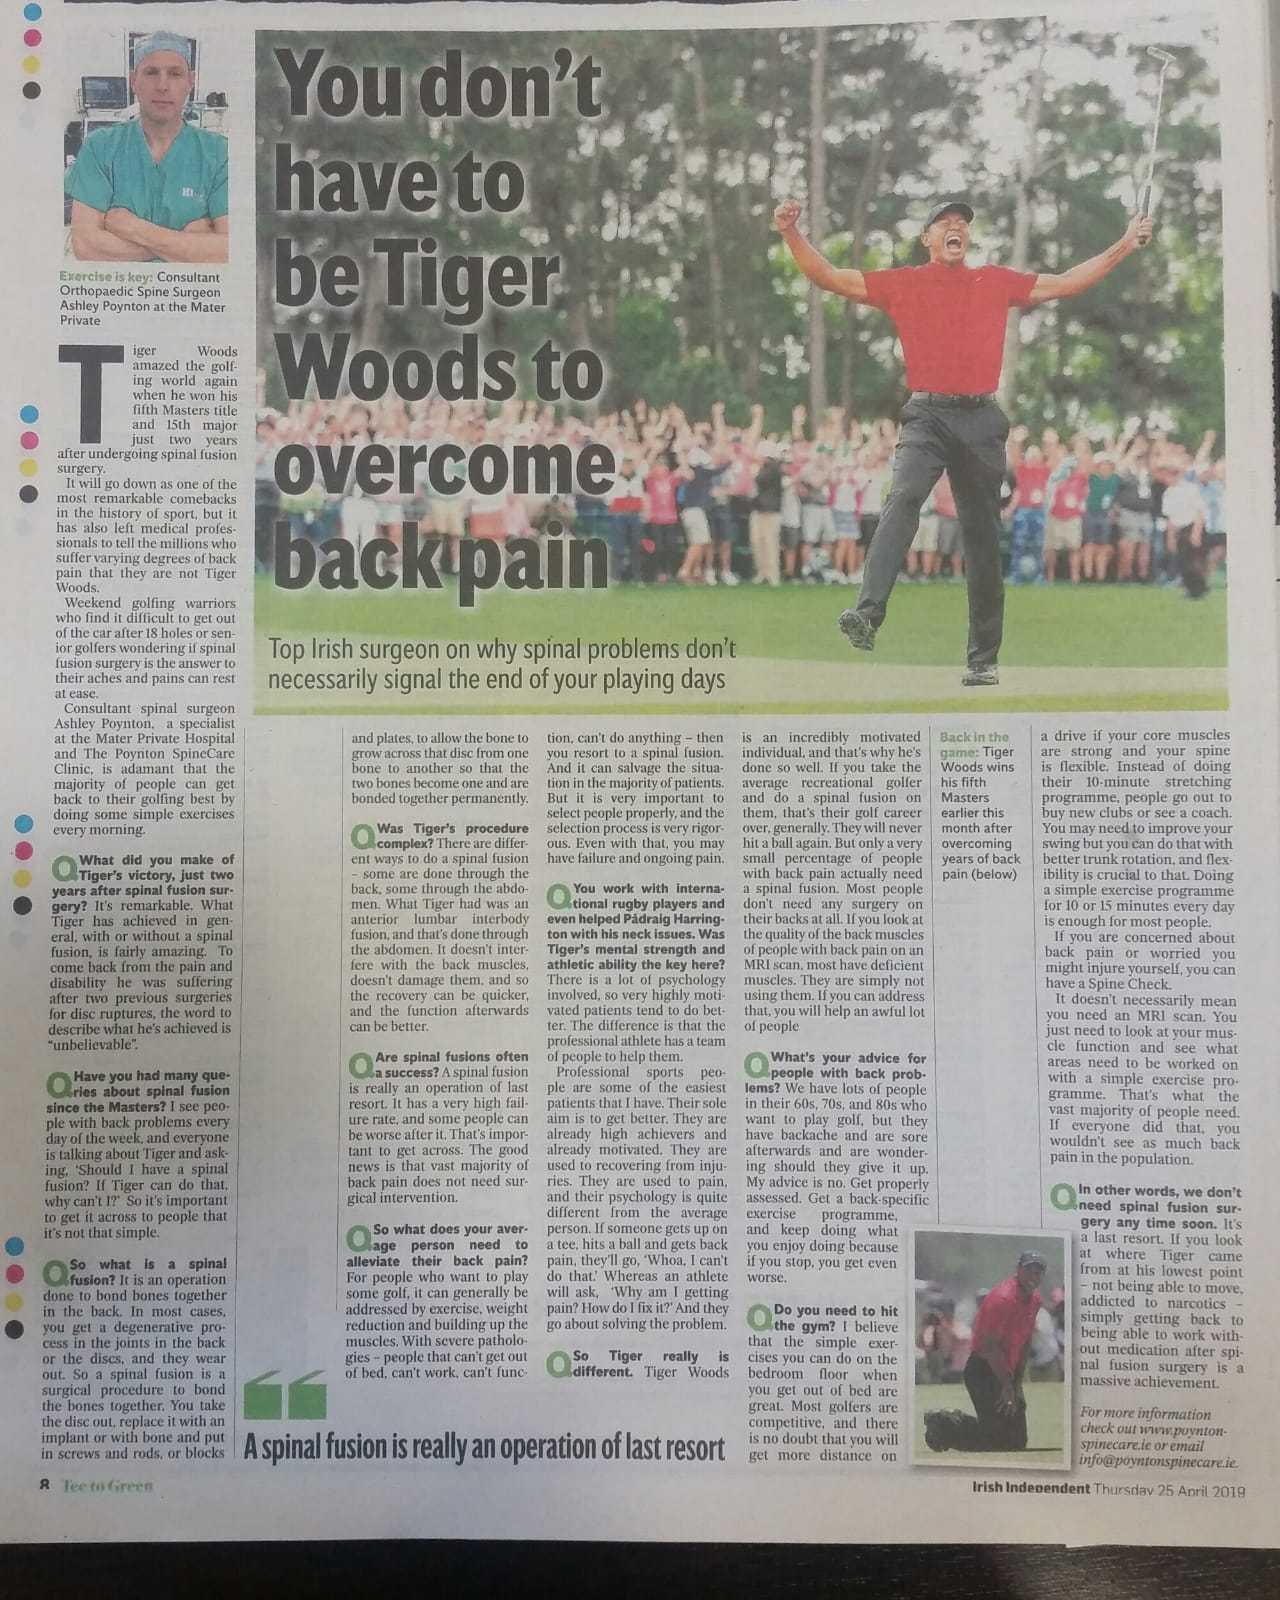 Irish Independent Golf Supplement Interview re Spinal Fusion